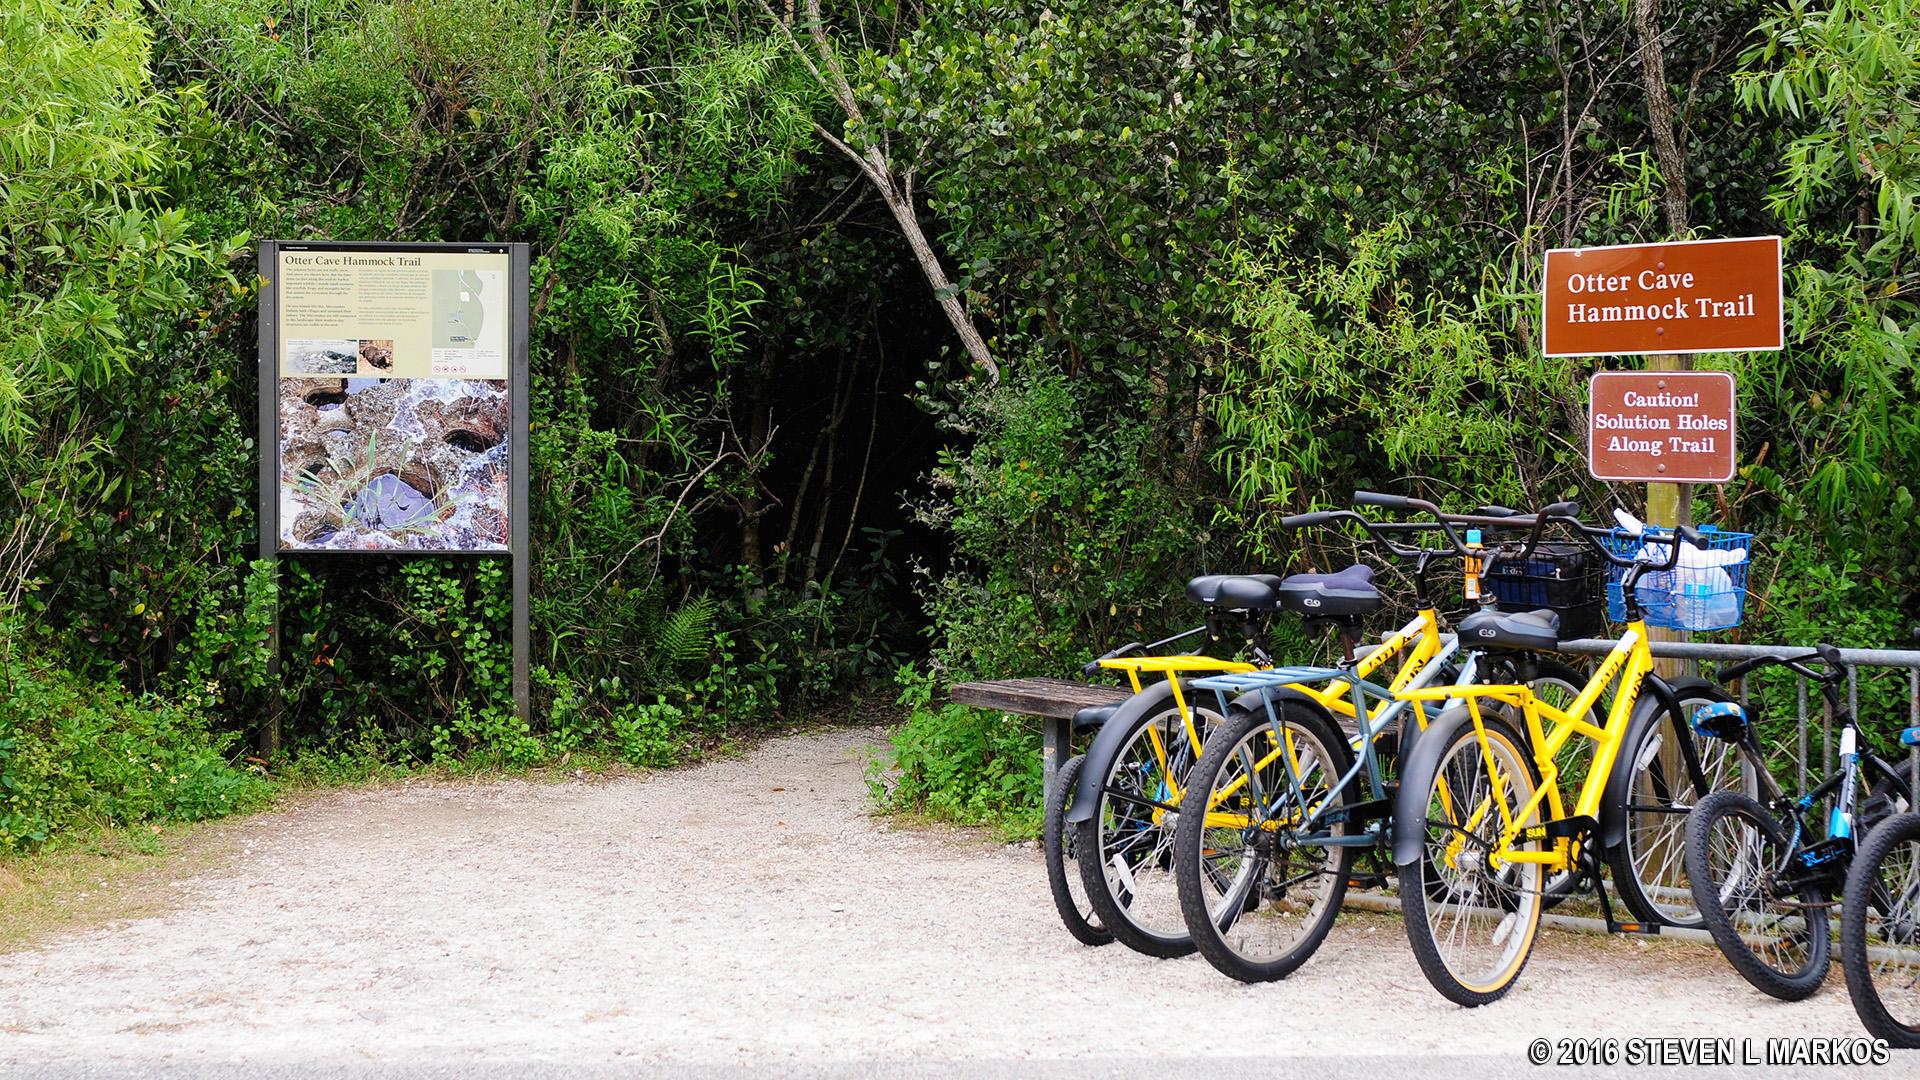 Hammock trails